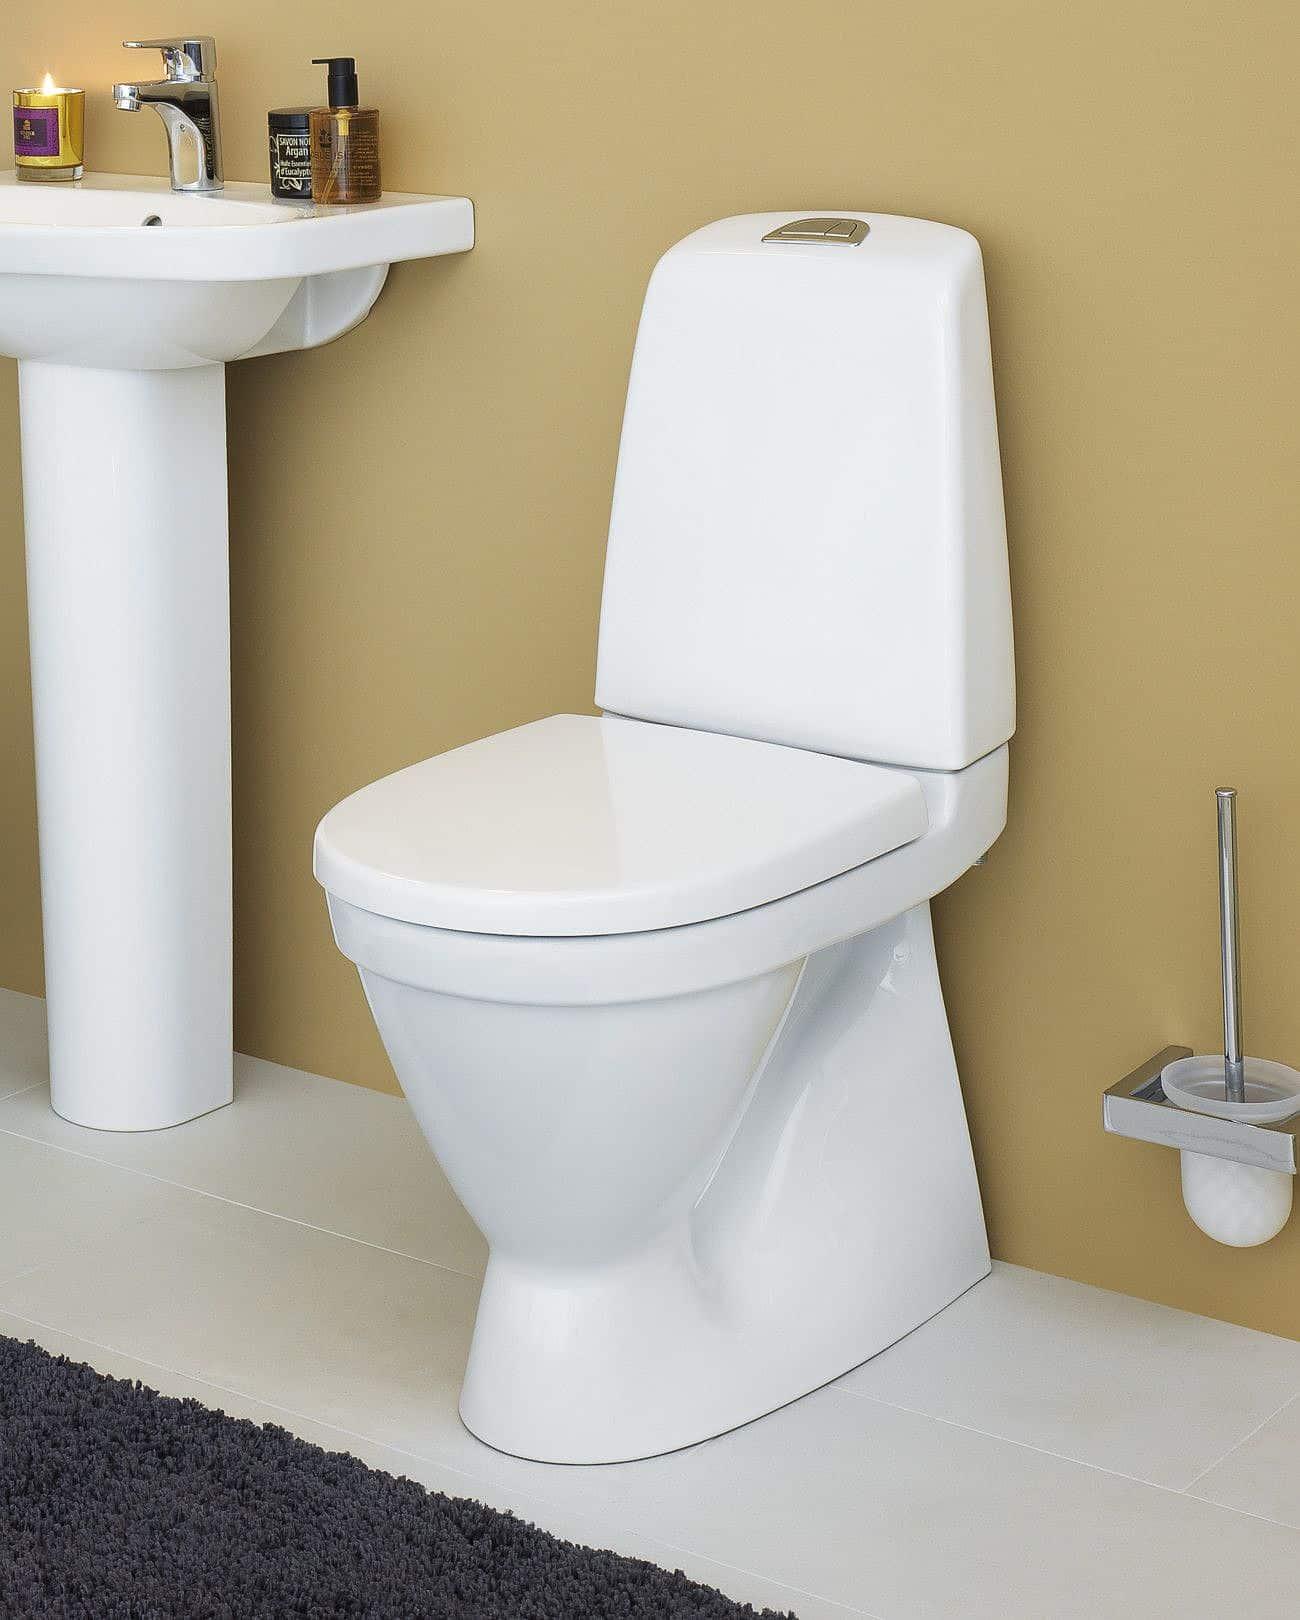 toilet_Nautic-1510